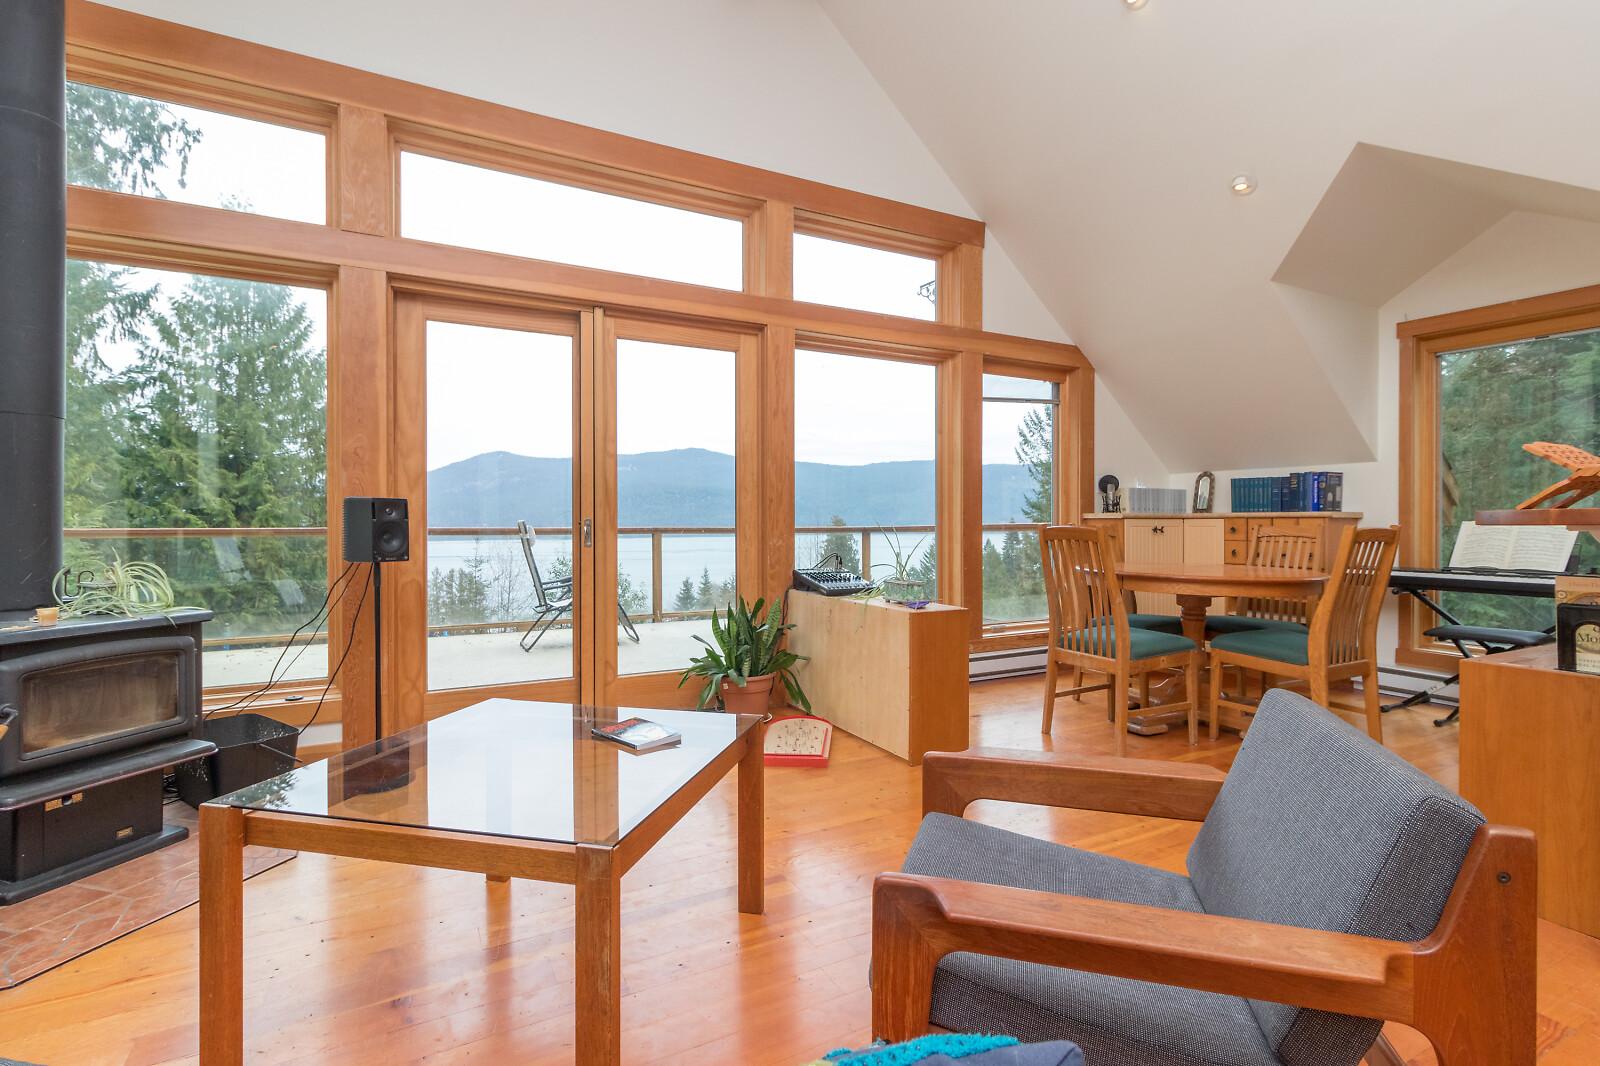 4362 Brentview Dr, Cowichan Bay, British Columbia  V0R 1N2 - Photo 3 - 868691